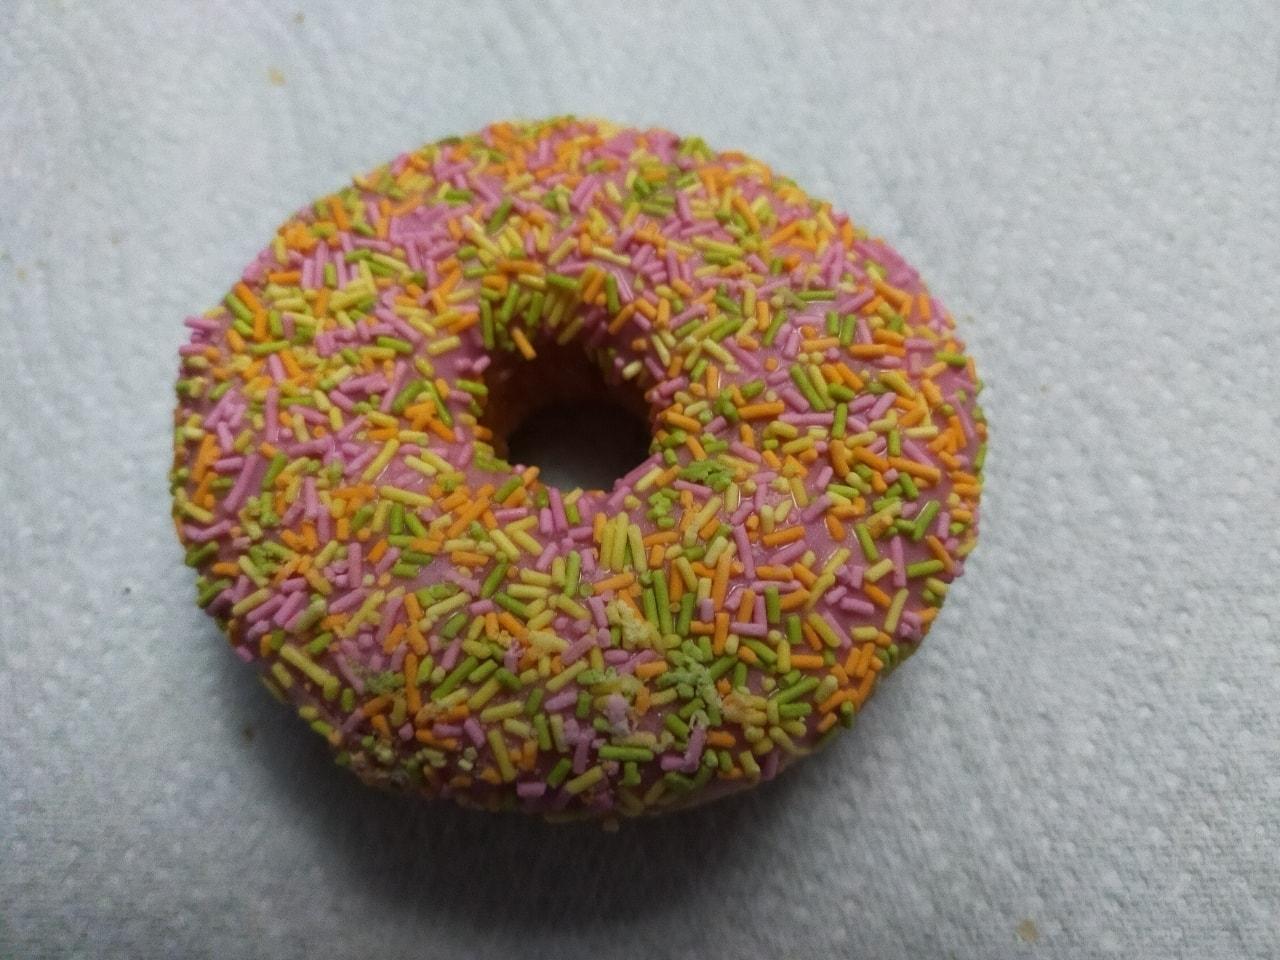 Tesco pink iced doughnut